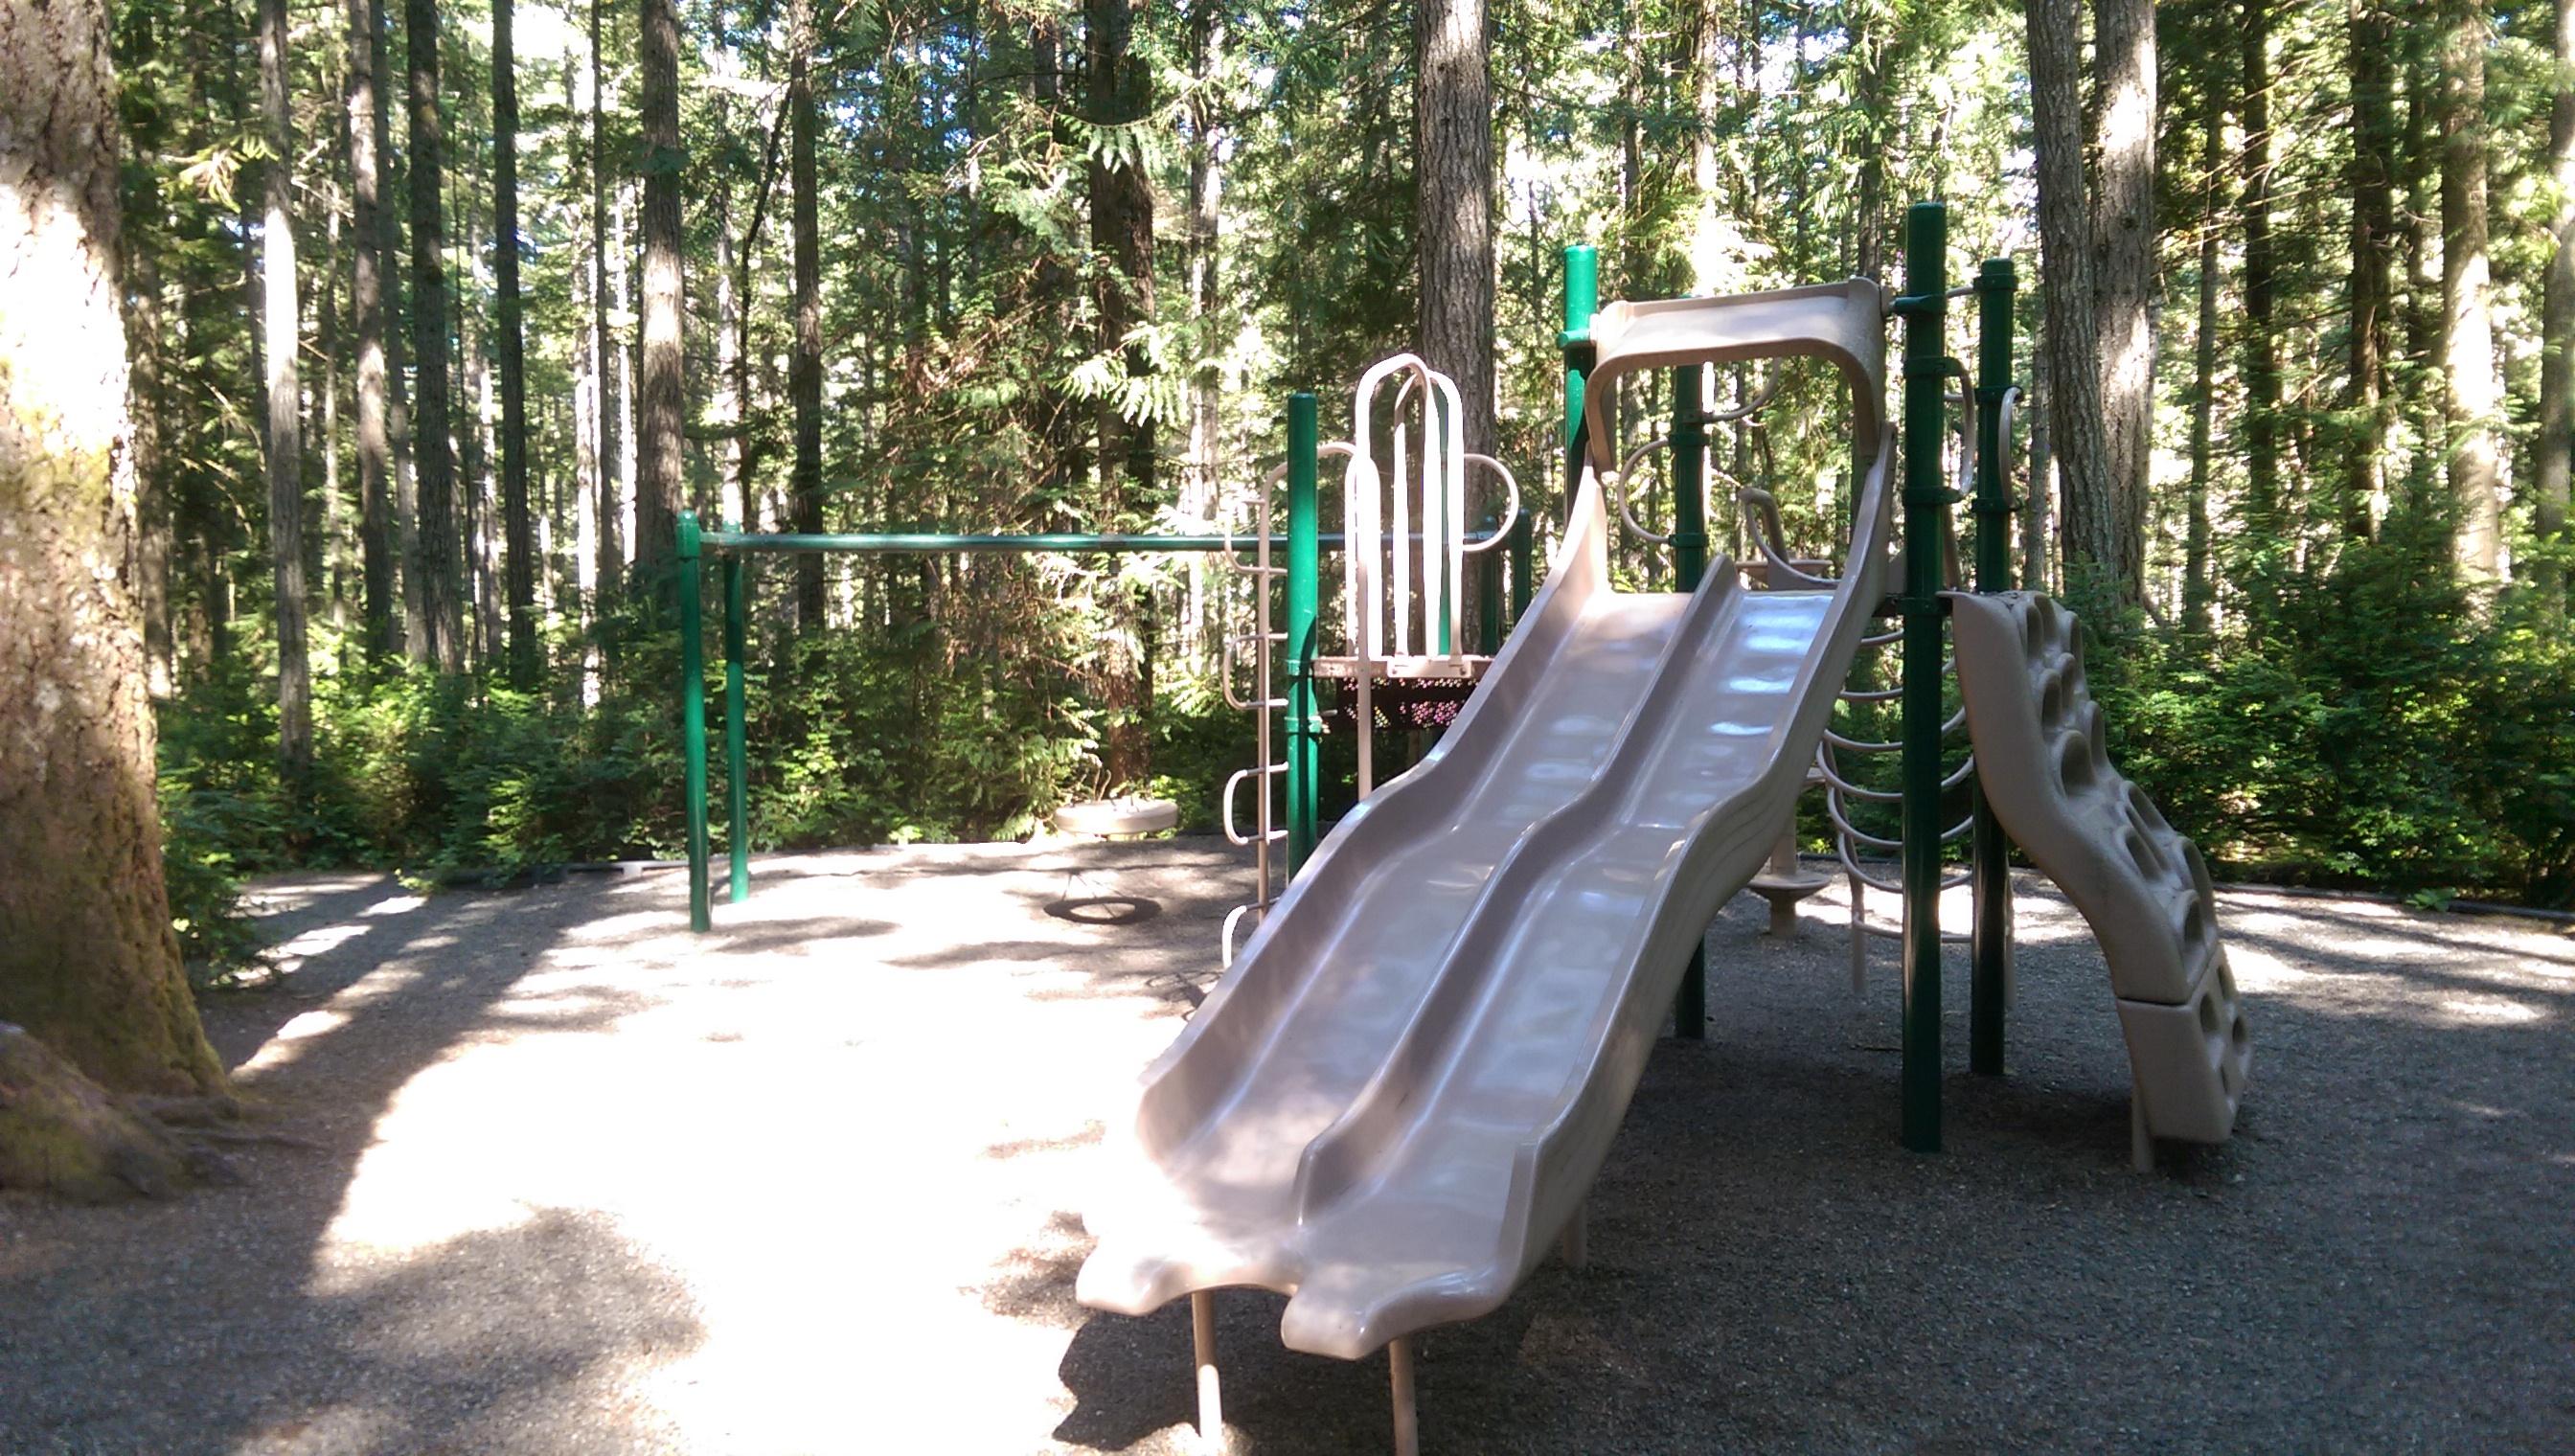 Drawn scenic park playground Washington Kid Scenic Campgrounds: Friendly